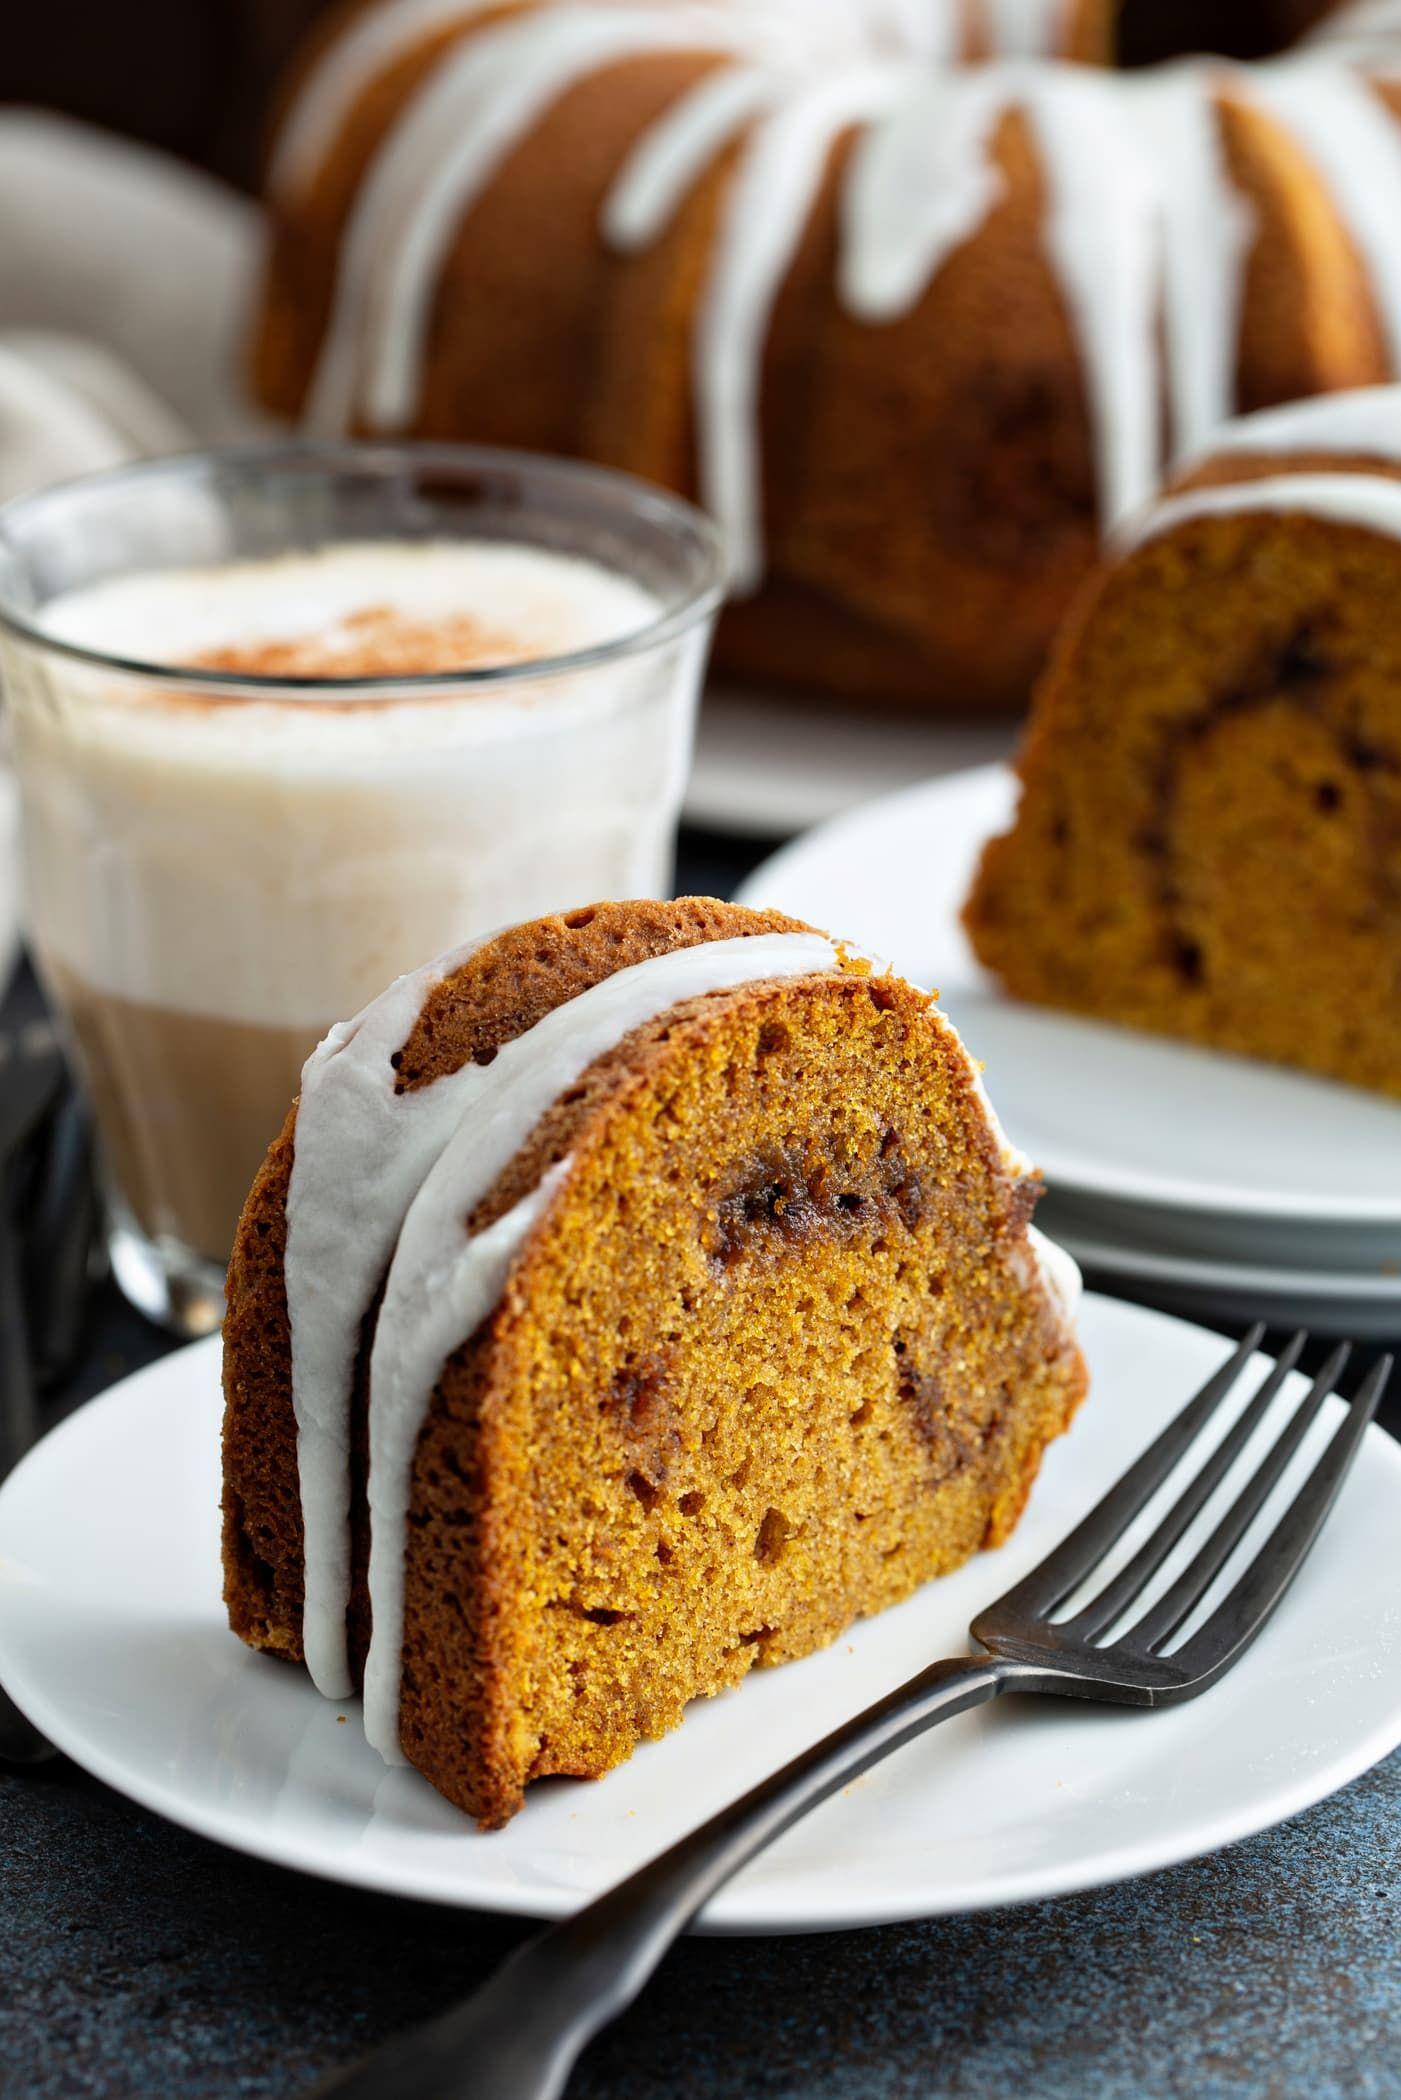 Sour Cream Cinnamon Swirl Pumpkin Bundt Cake - Oh